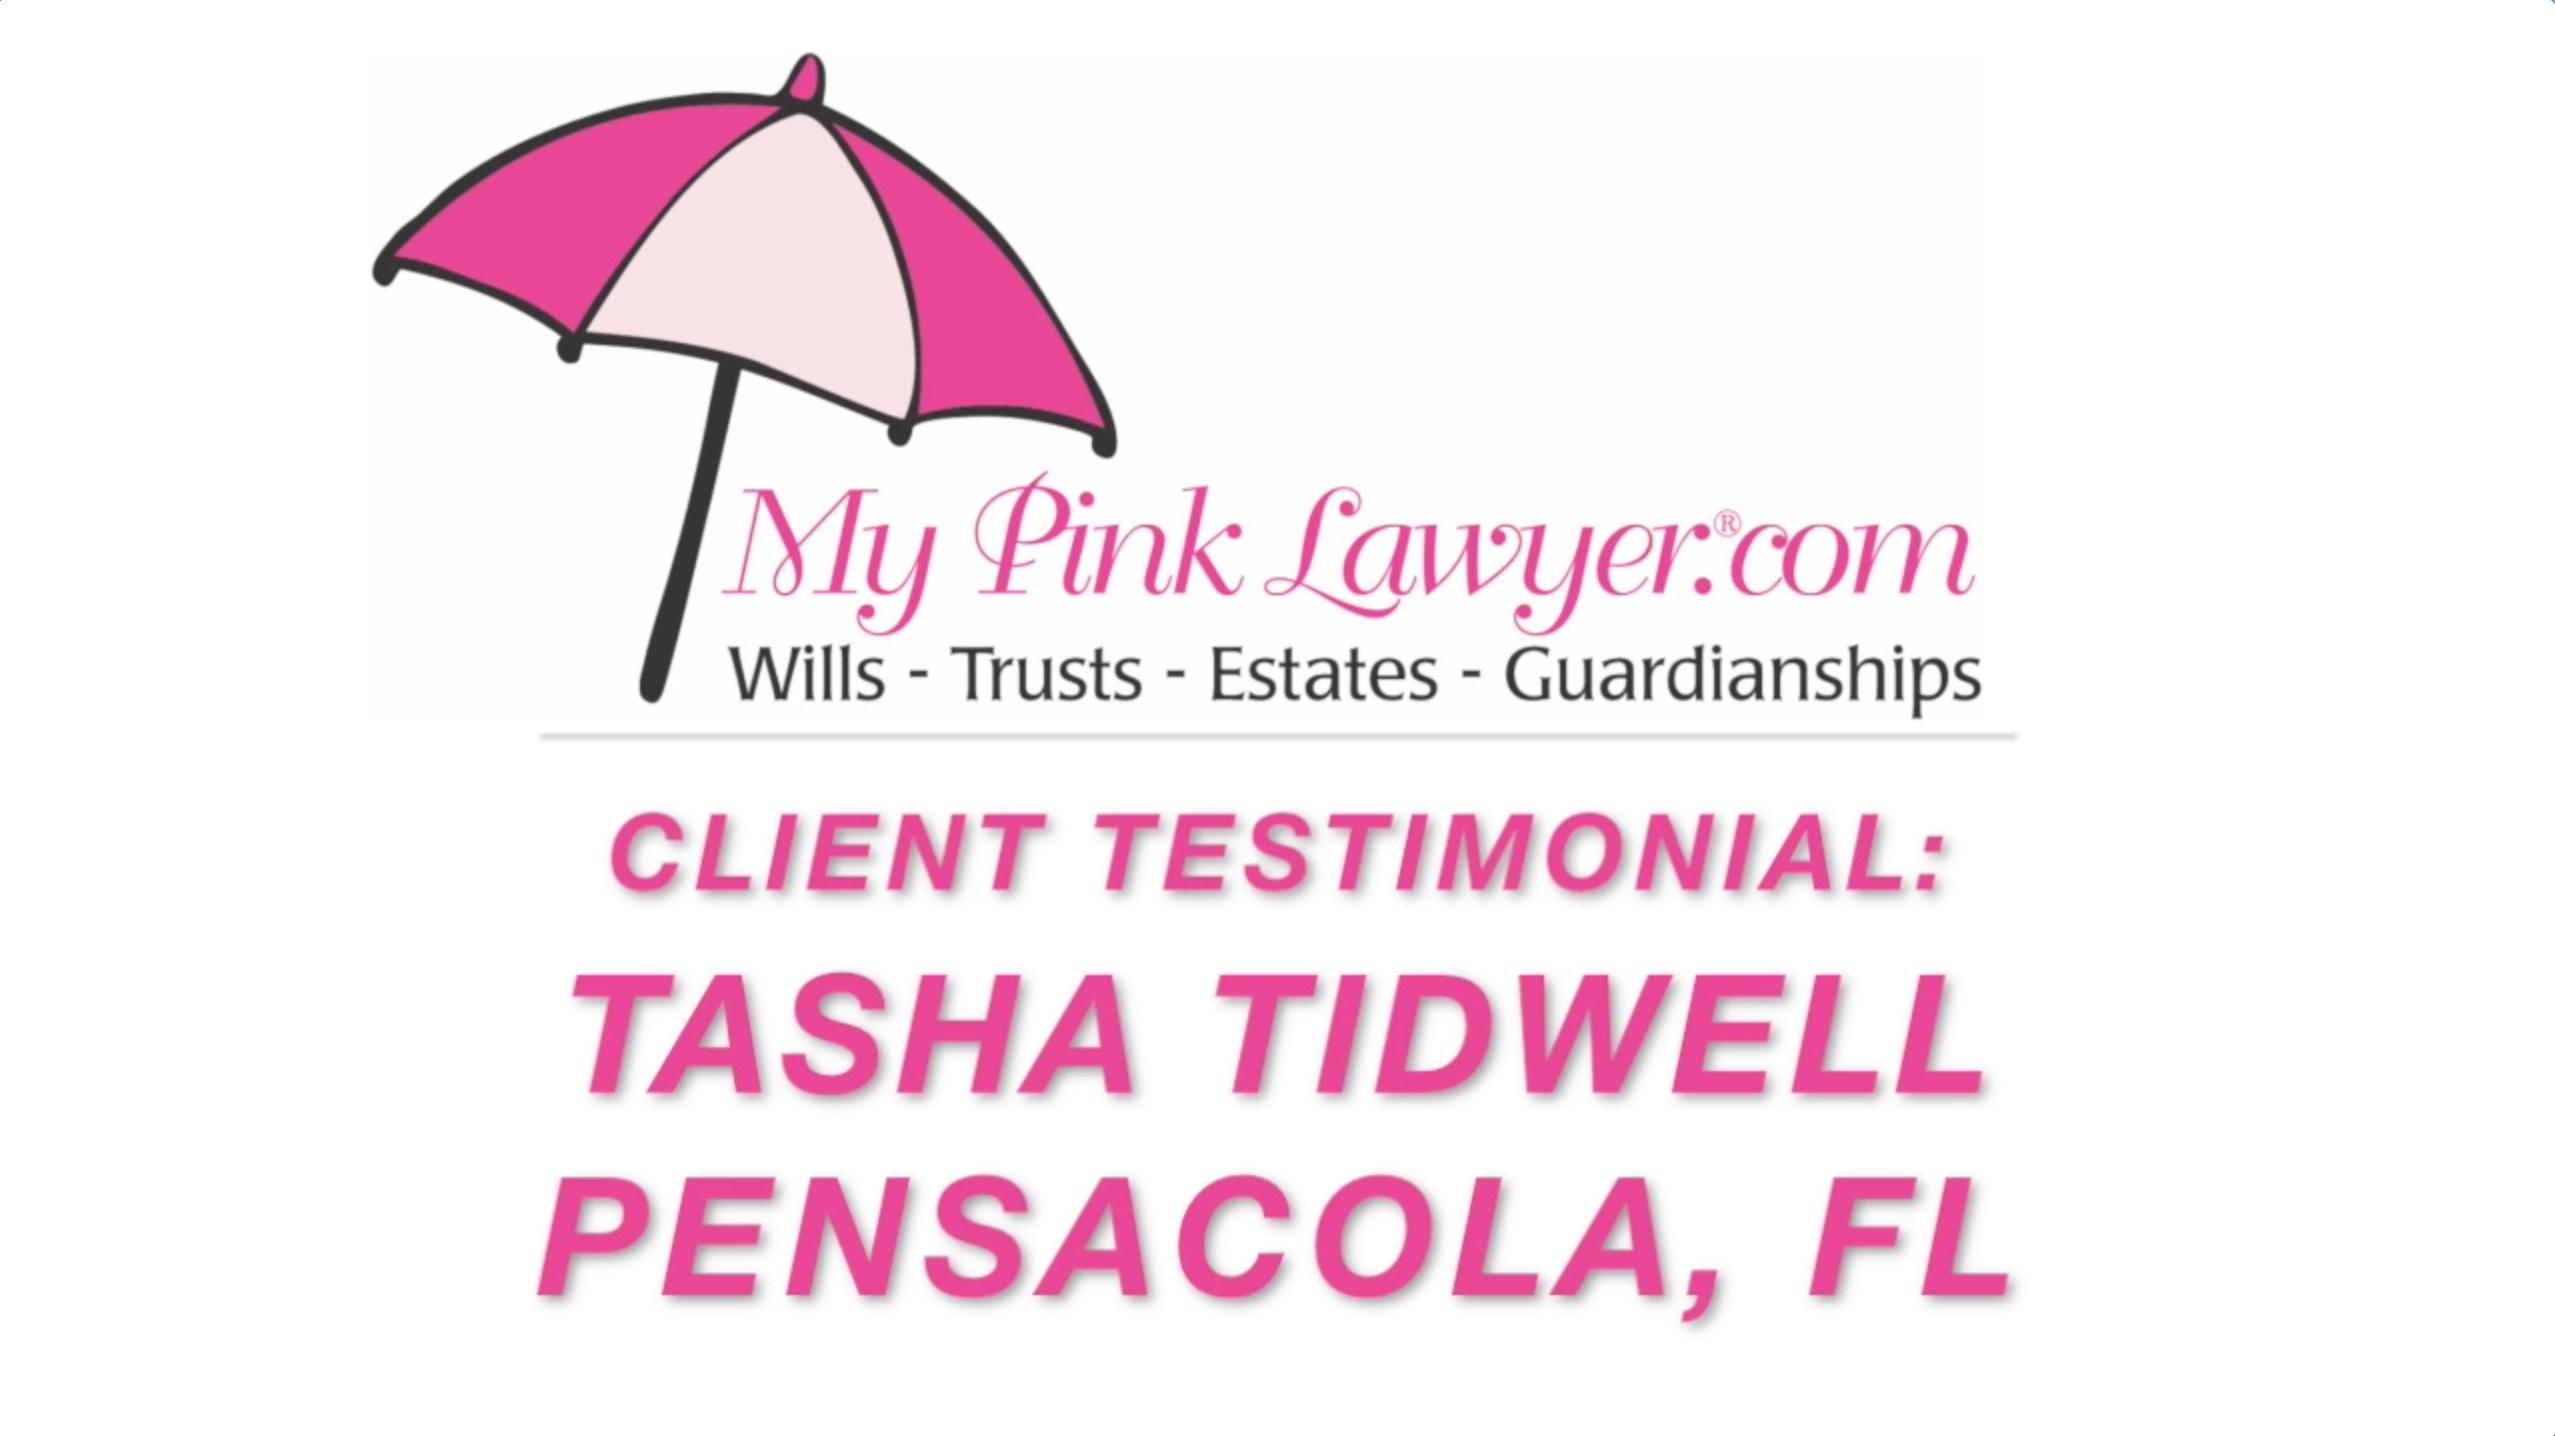 Tasha Tidwell, Pensacola